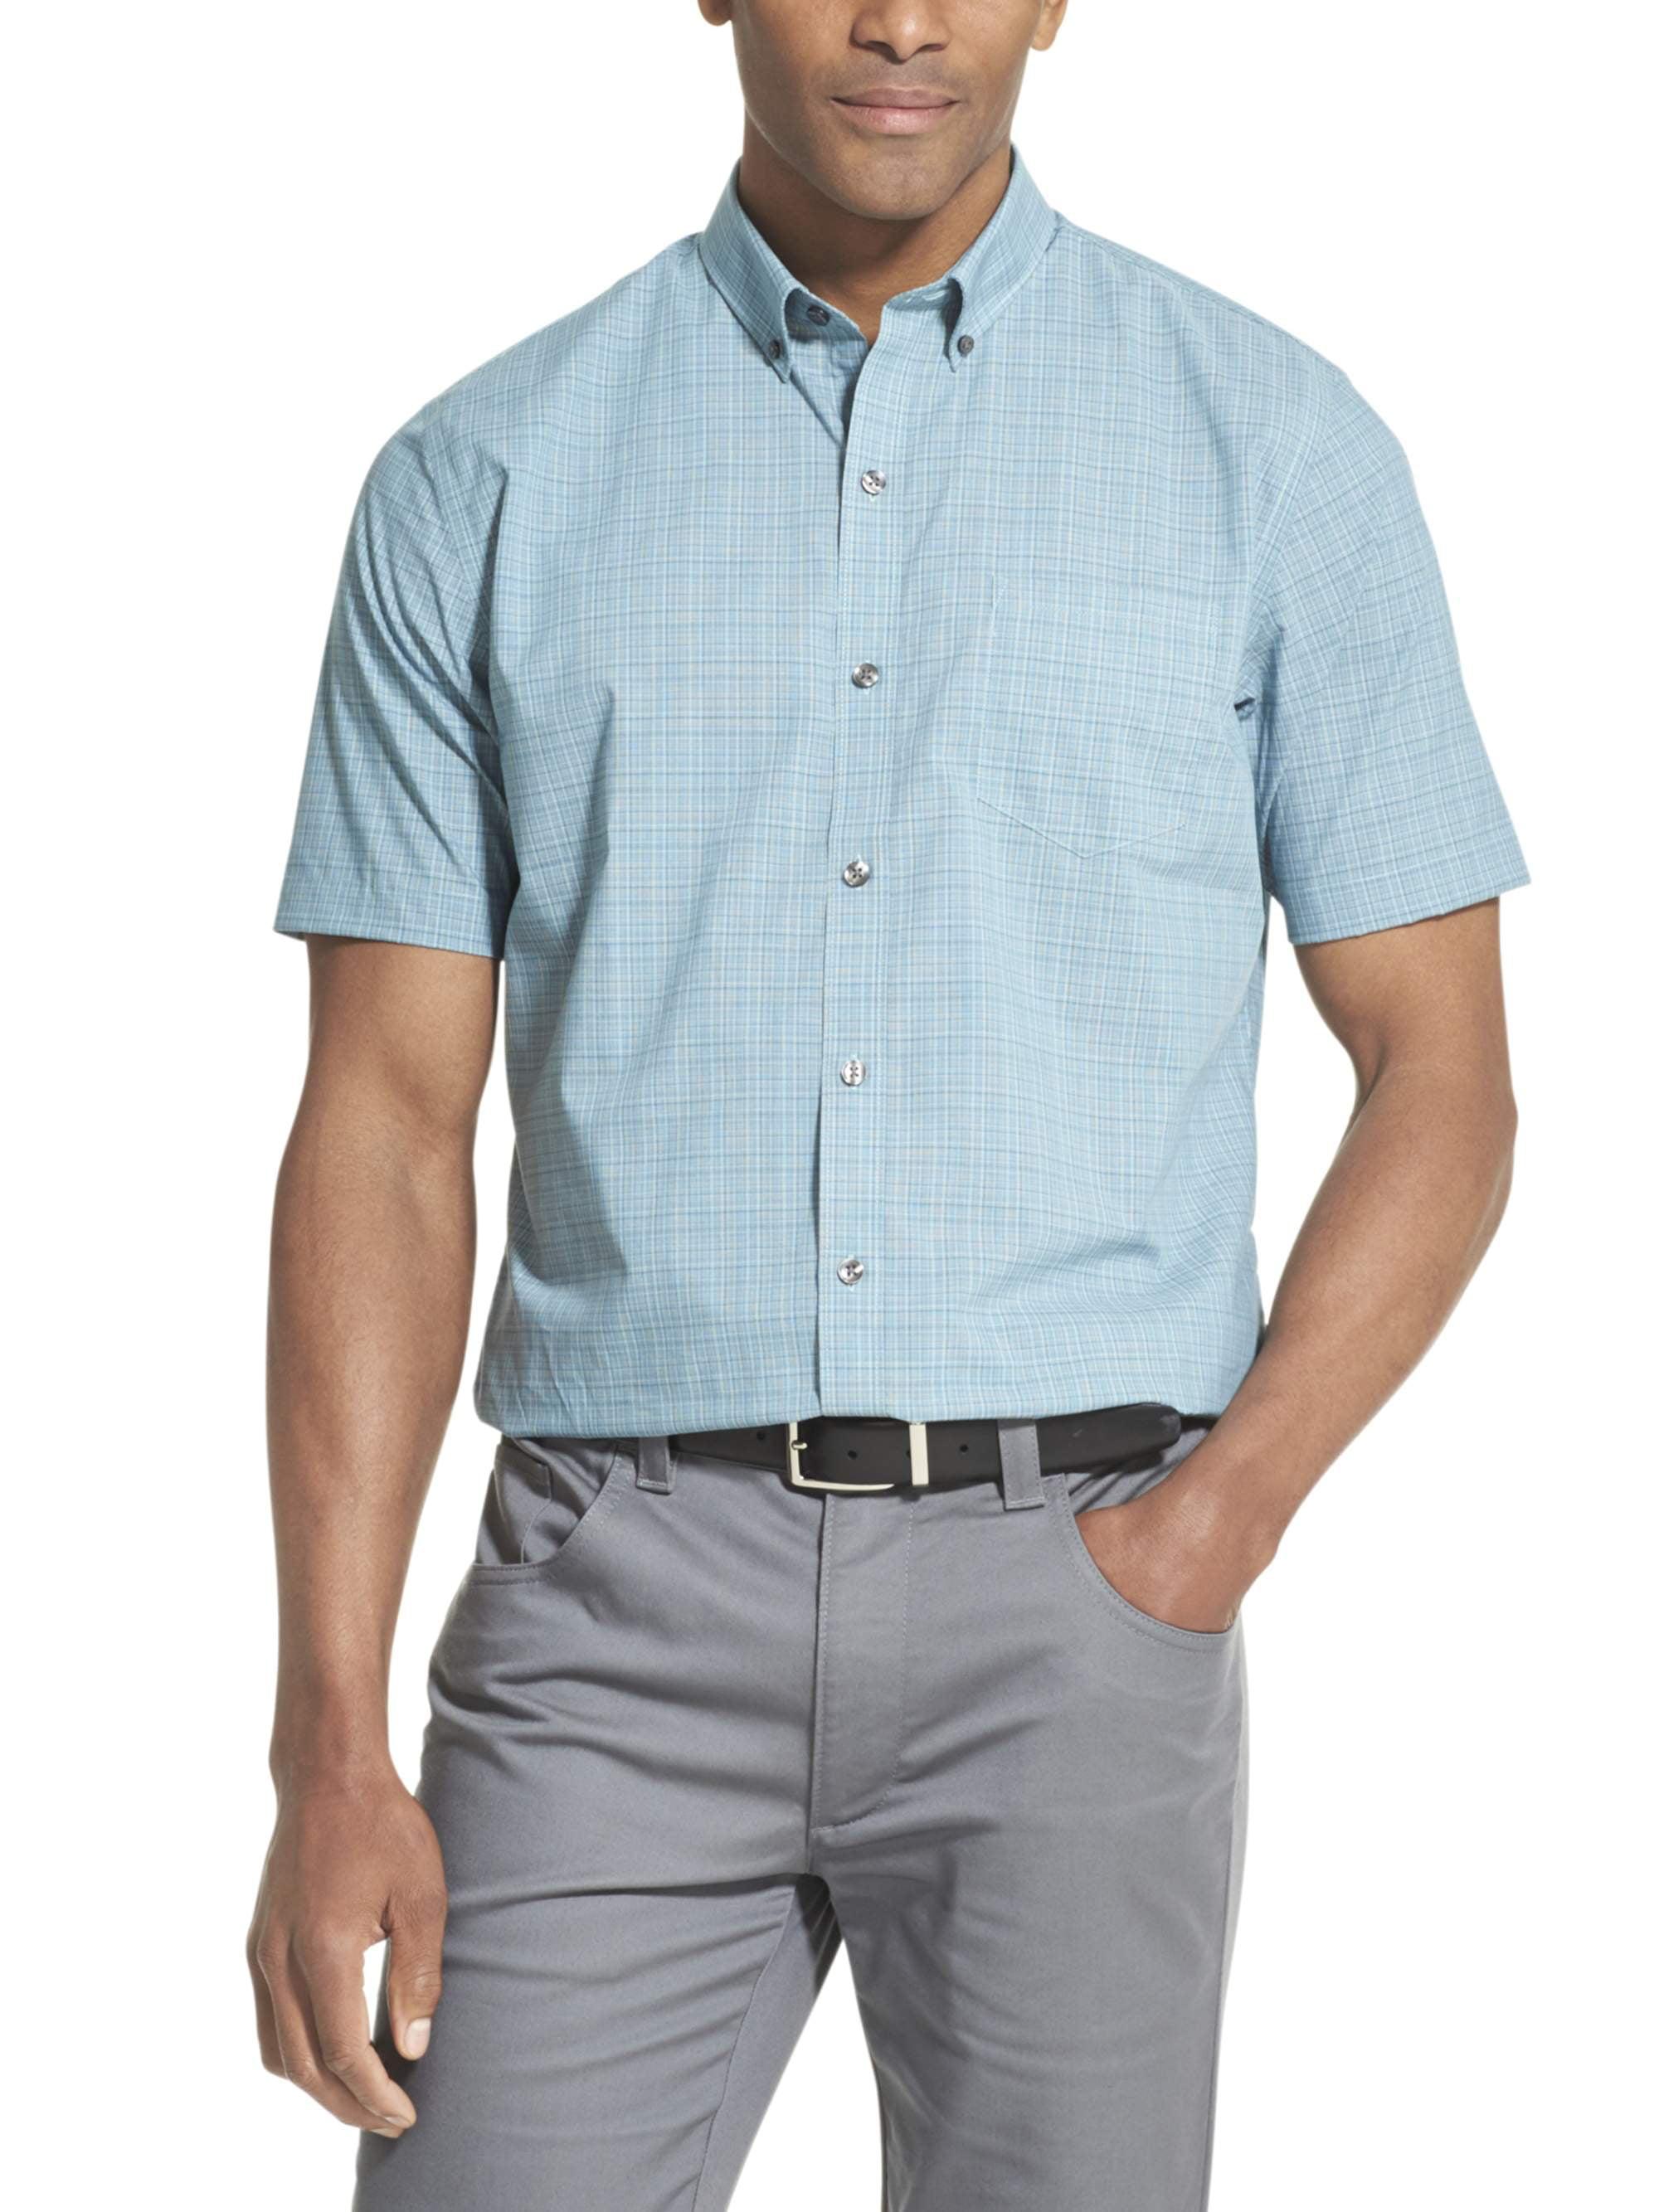 Comaba Mens Peaked Lapel Plus-Size Casual Stripes Printed Long-Sleeve Denim Shirt